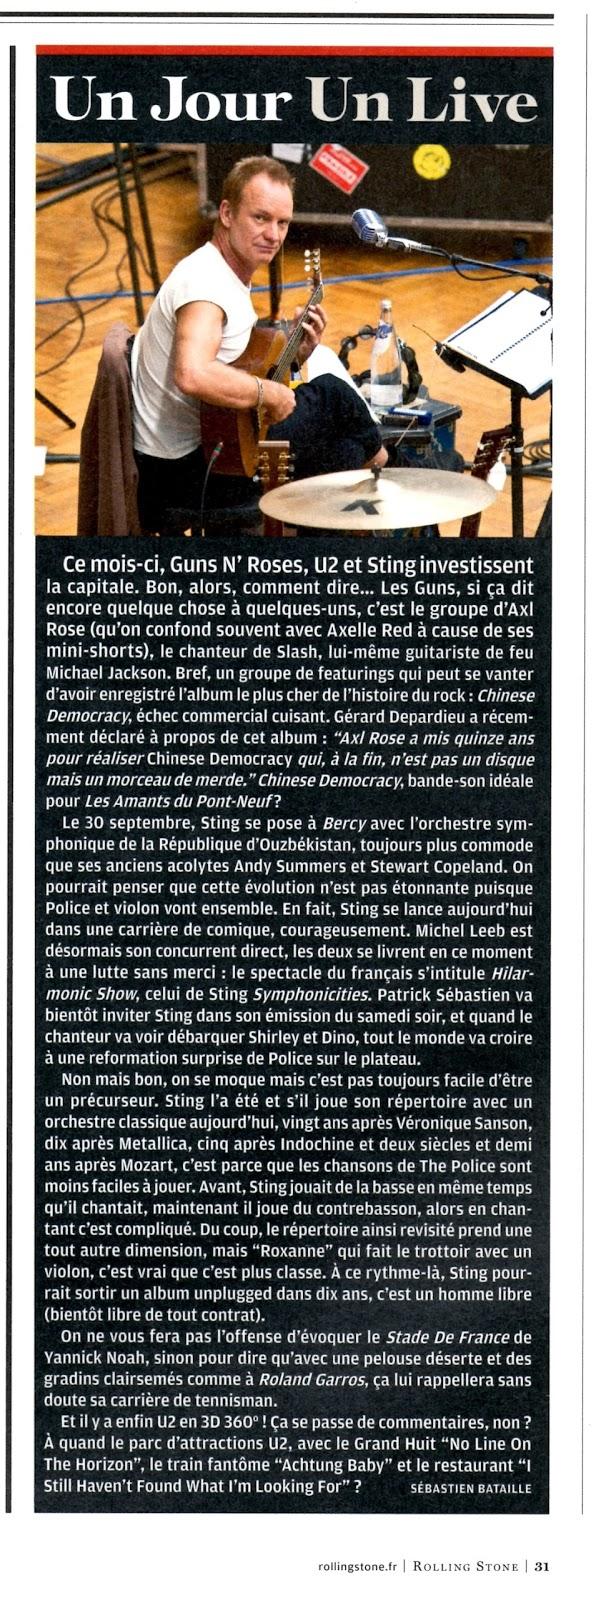 Sting, Sébastien Bataille, concert U2, Chinese democracy, Axl Rose, Guns N'Roses, Sting acoustic, Sebastien Bataille, Sébastien Bataille Rolling Stone, U2 360°